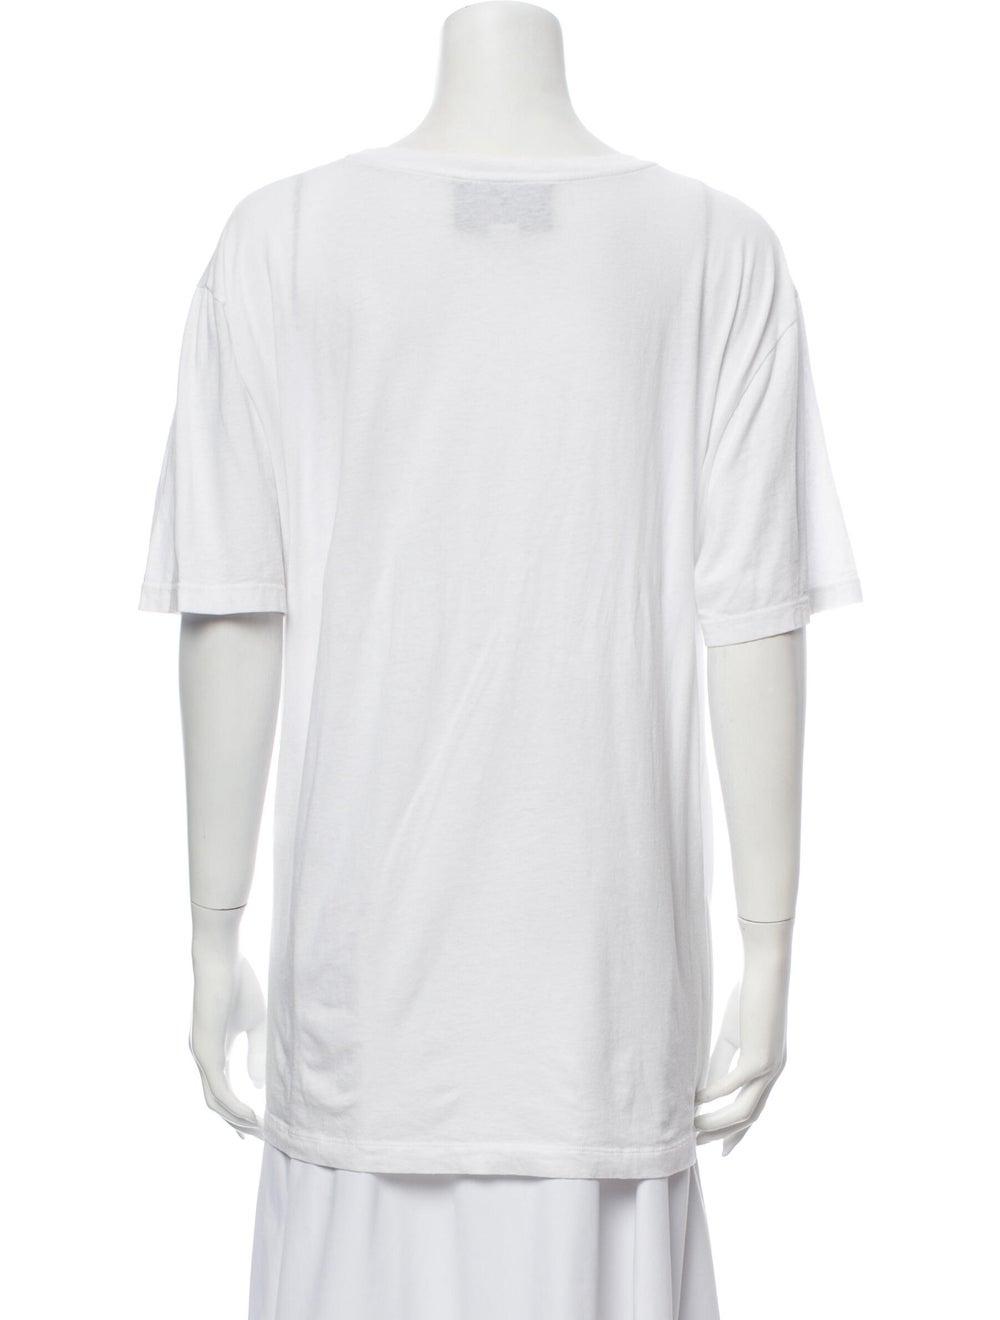 Gucci 2018 Oversize Vintage Logo T-Shirt White - image 3